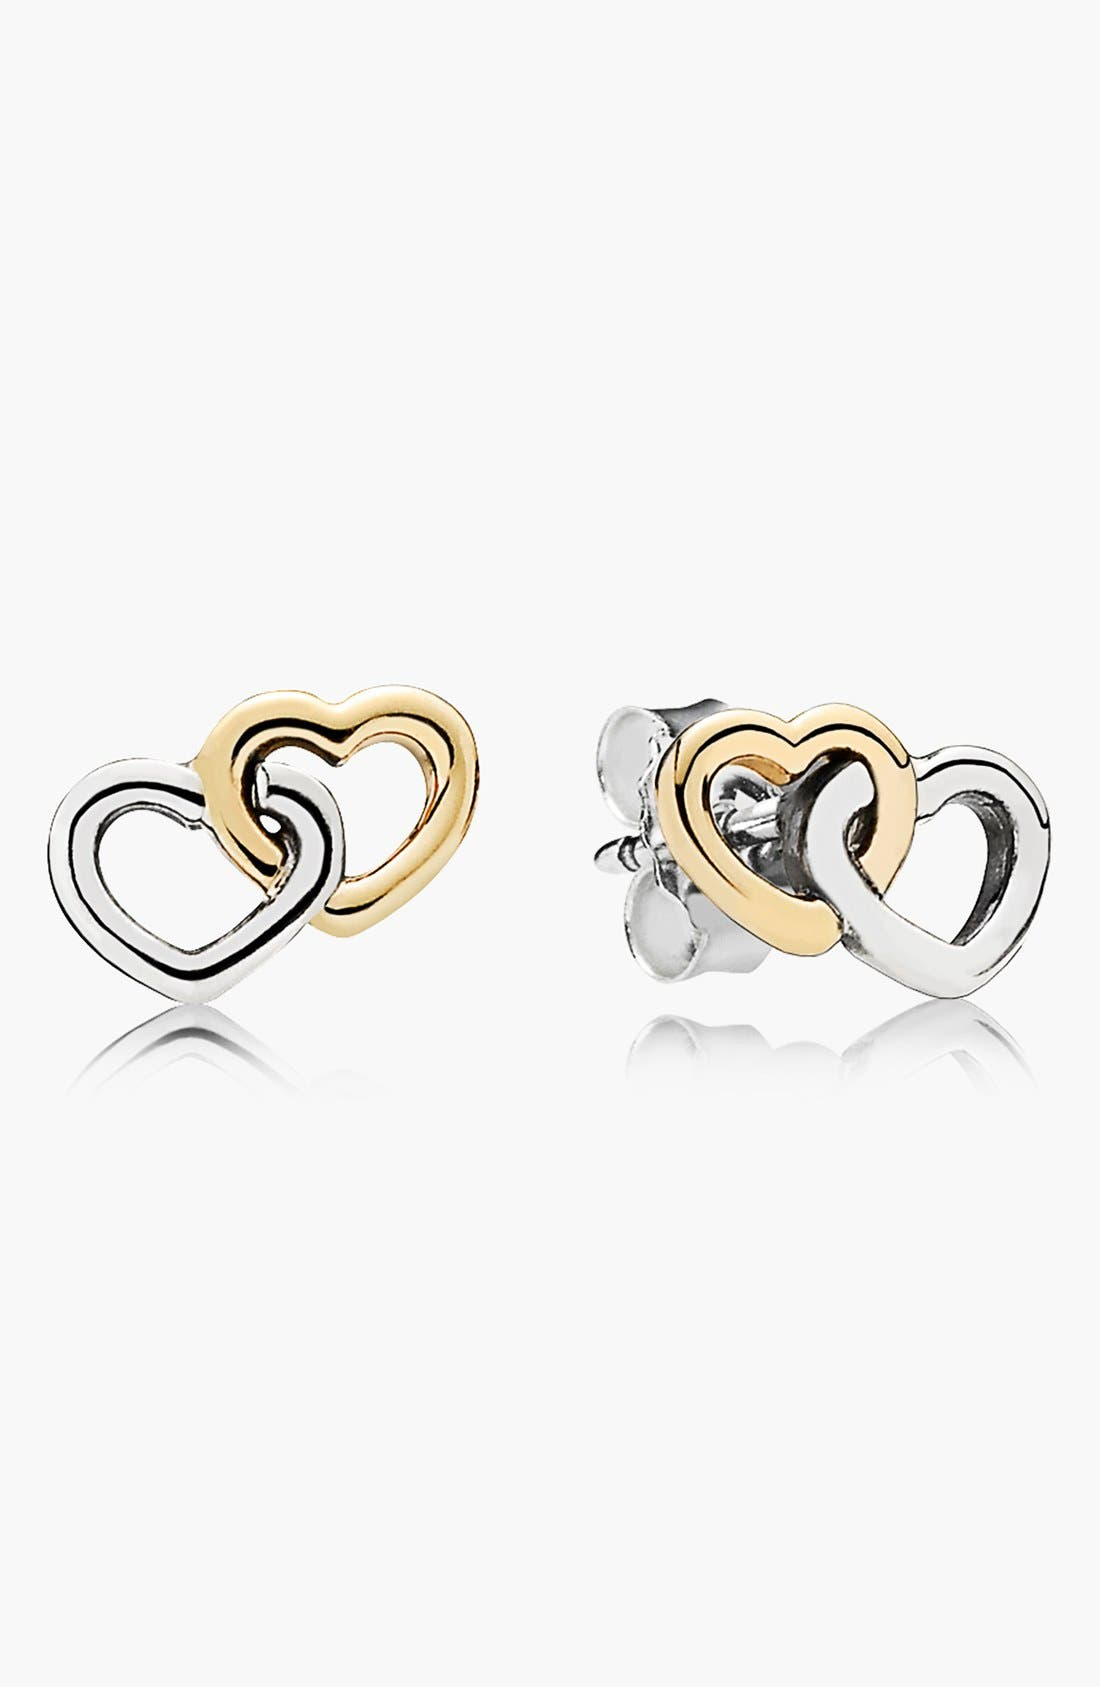 Main Image - PANDORA 'Heart to Heart' Stud Earrings